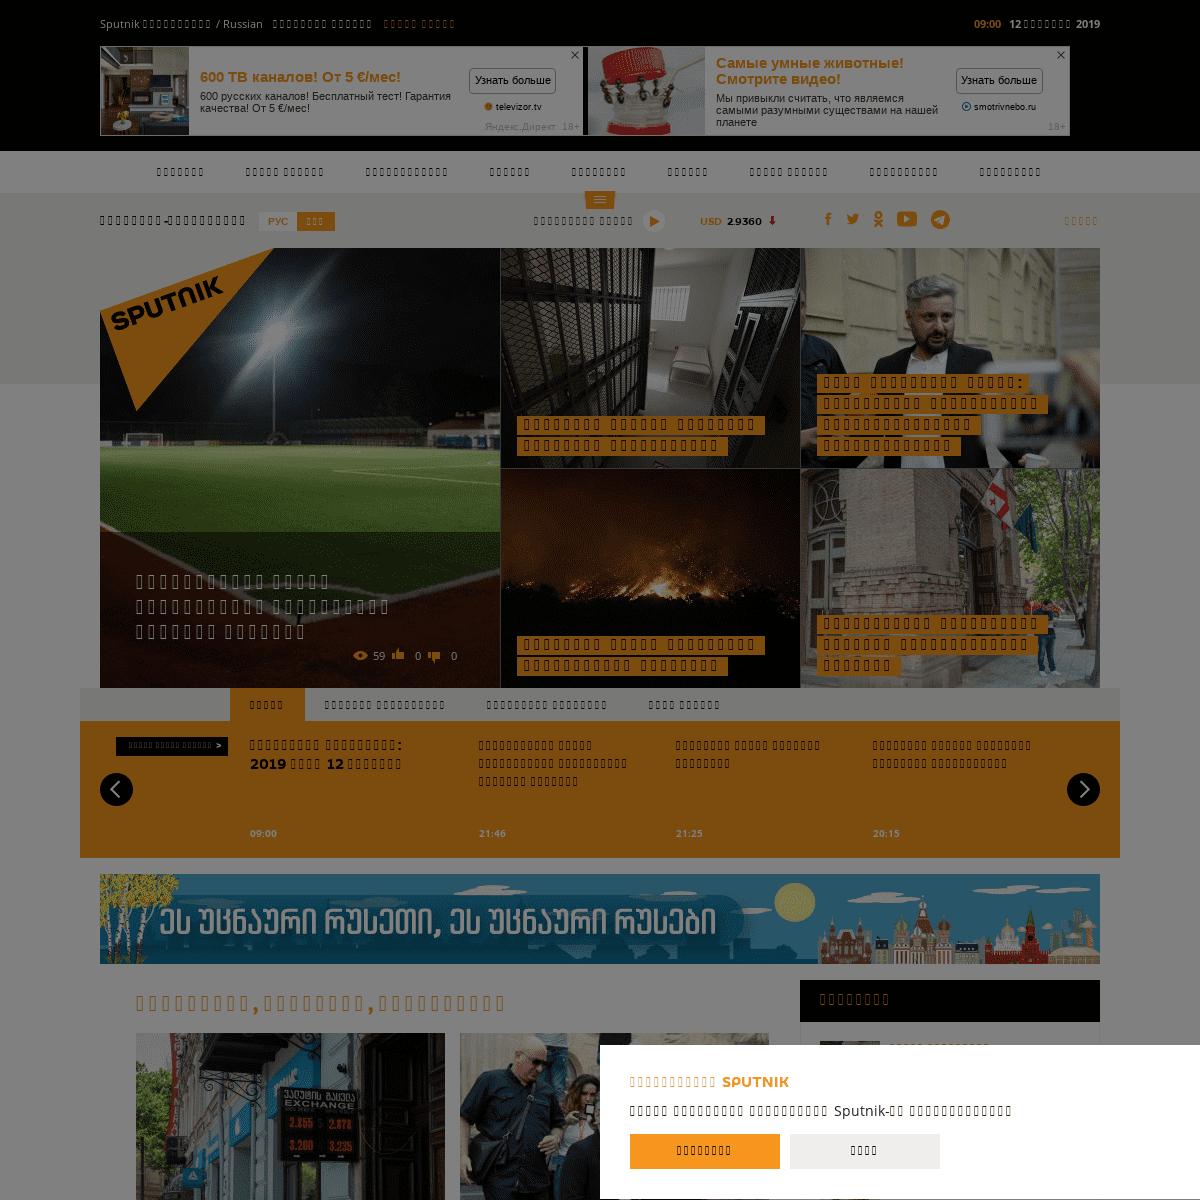 Sputnik საქართველო- ახალი ამბები 2019 დღეს სპუტნიკი ონლ�